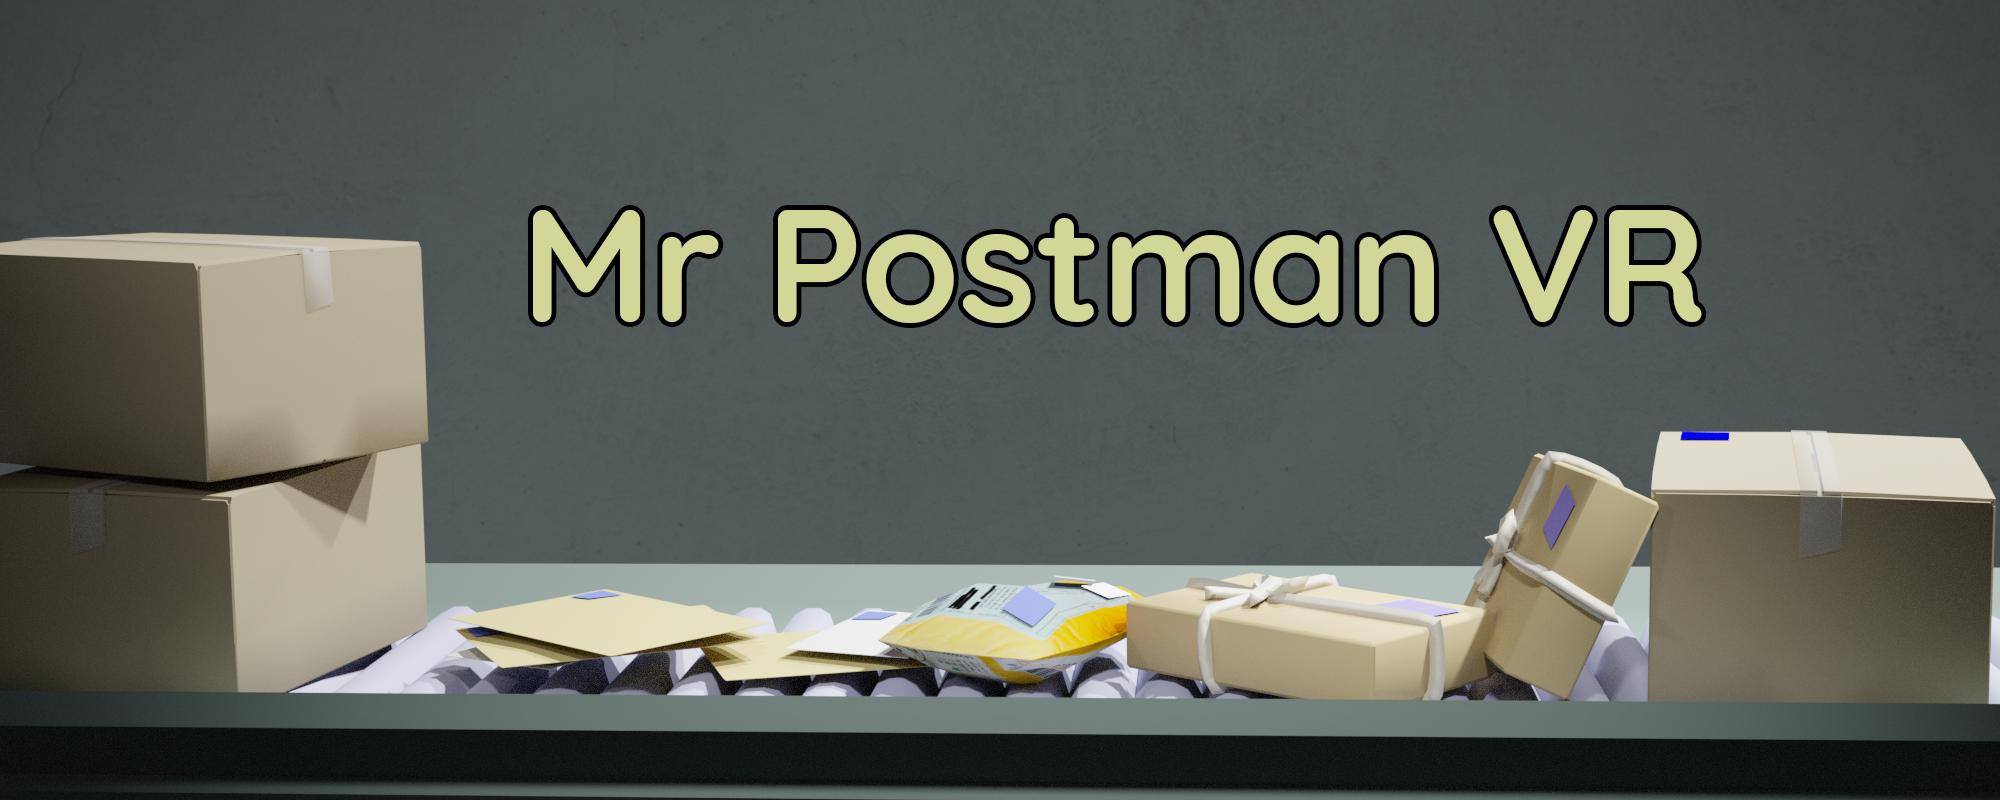 Mr Postman VR